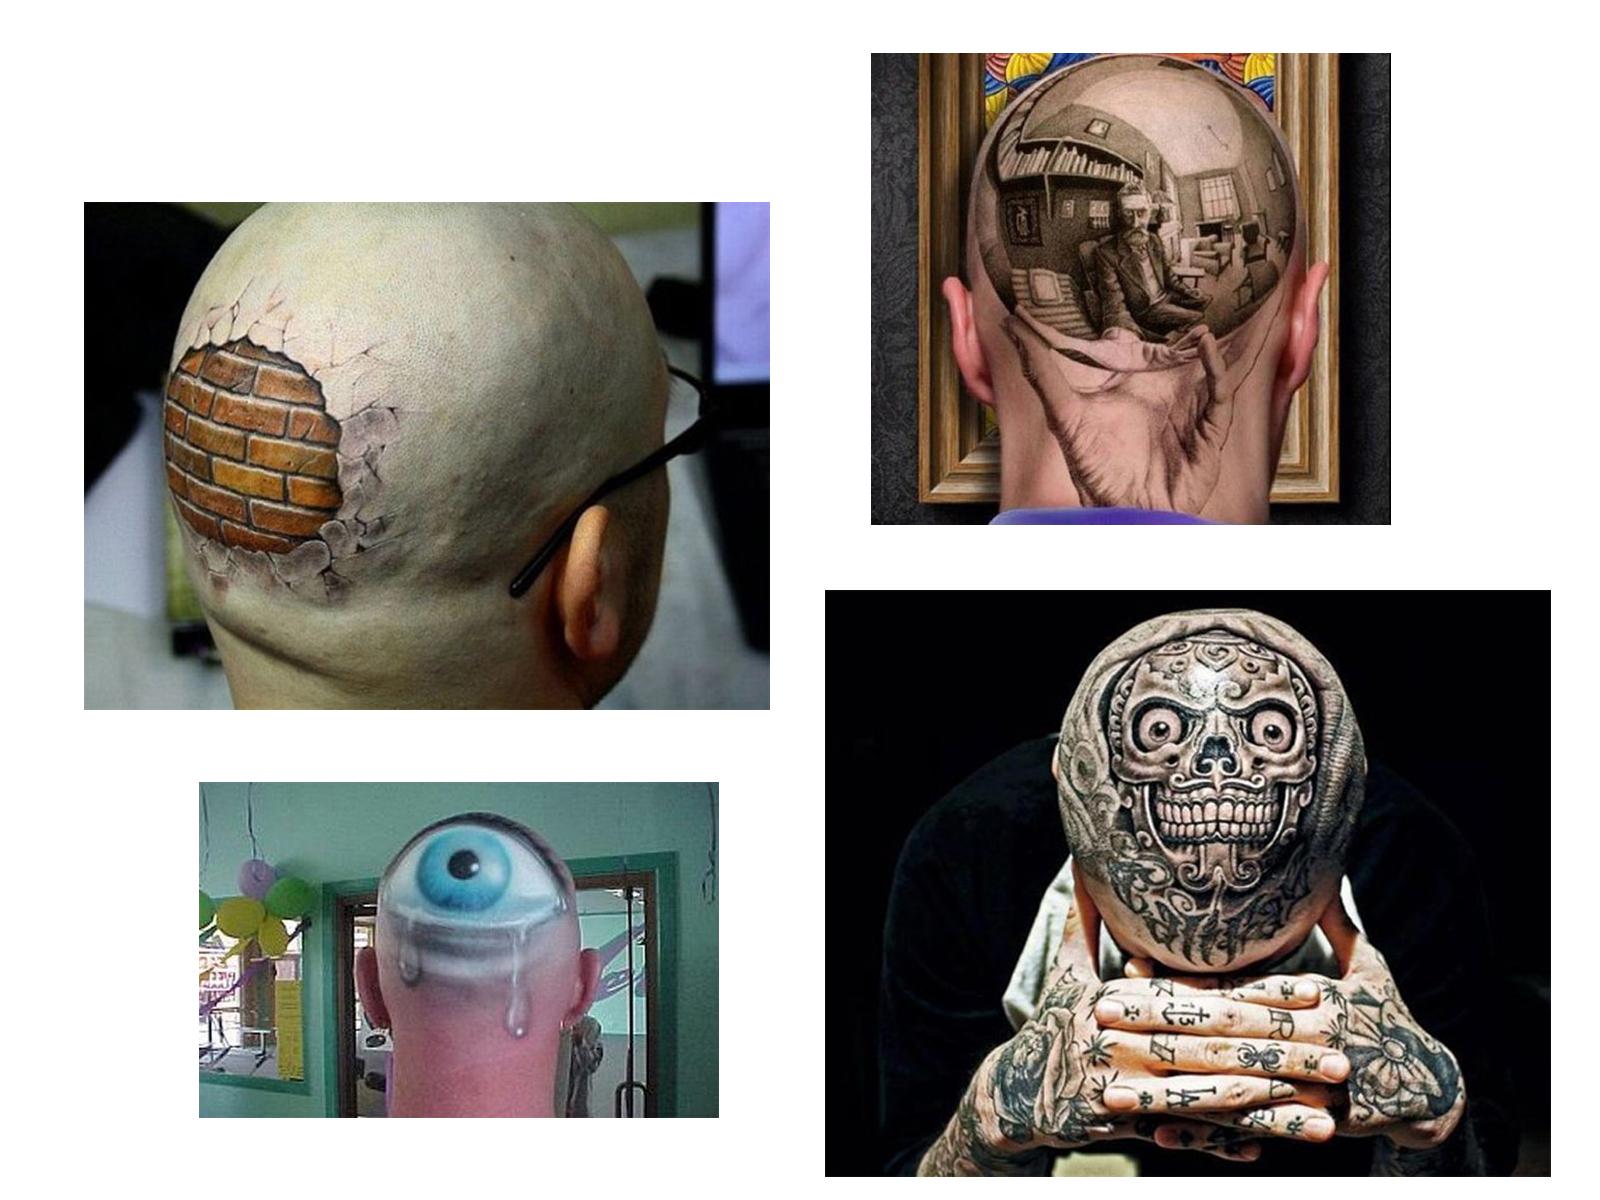 10 Most Hilarious Baldhead Tattoos in the World!